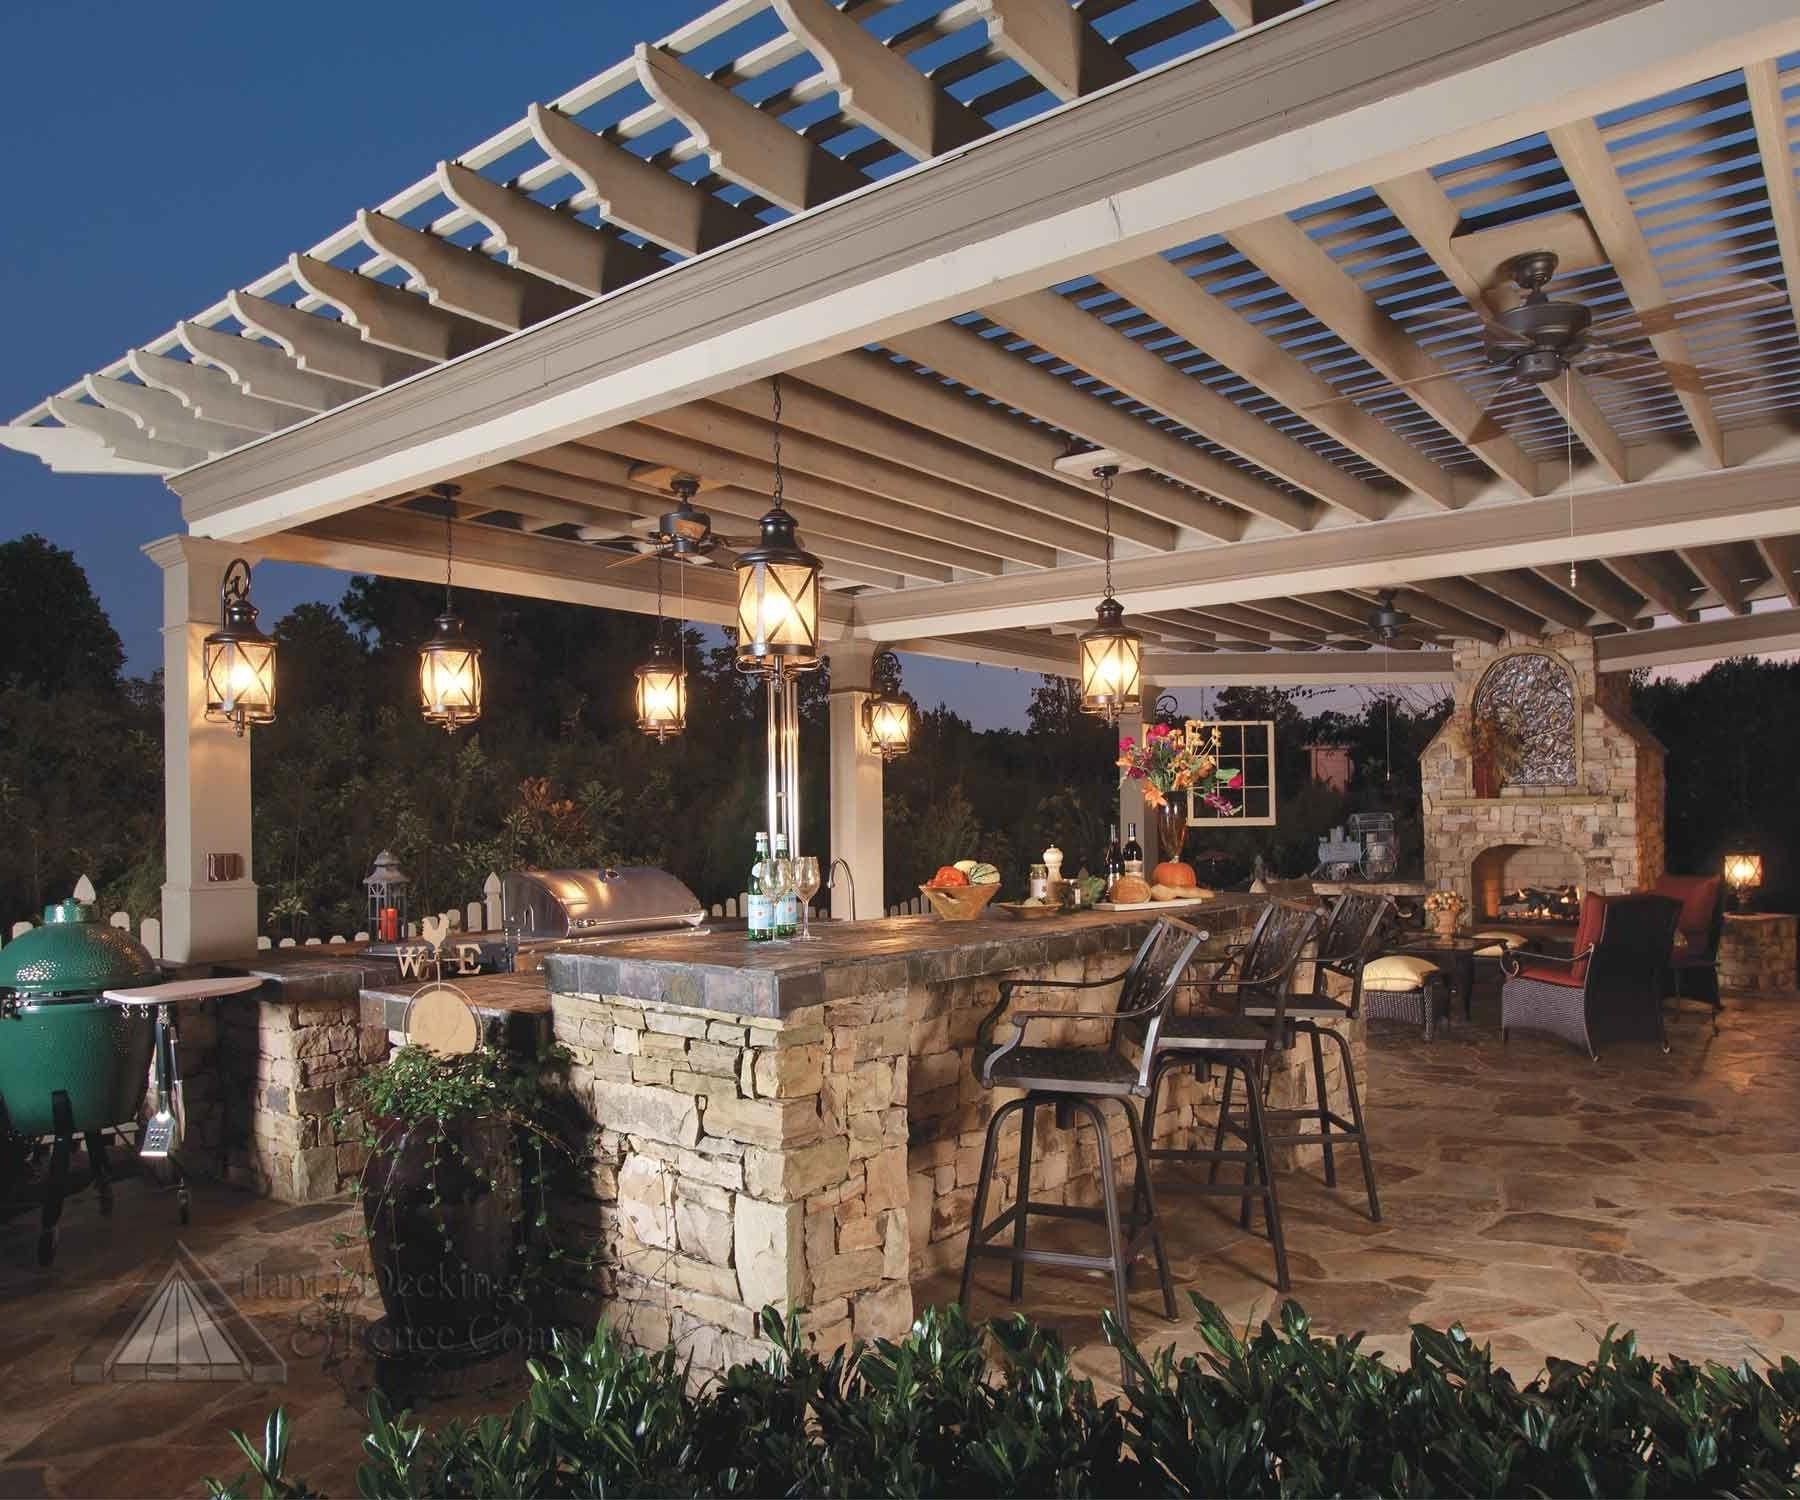 Outdoor Lighting Pendant Fixtures With Fashionable Lighting: Beautiful Outdoor Hanging Lights For Outdoor Lighting (View 11 of 20)